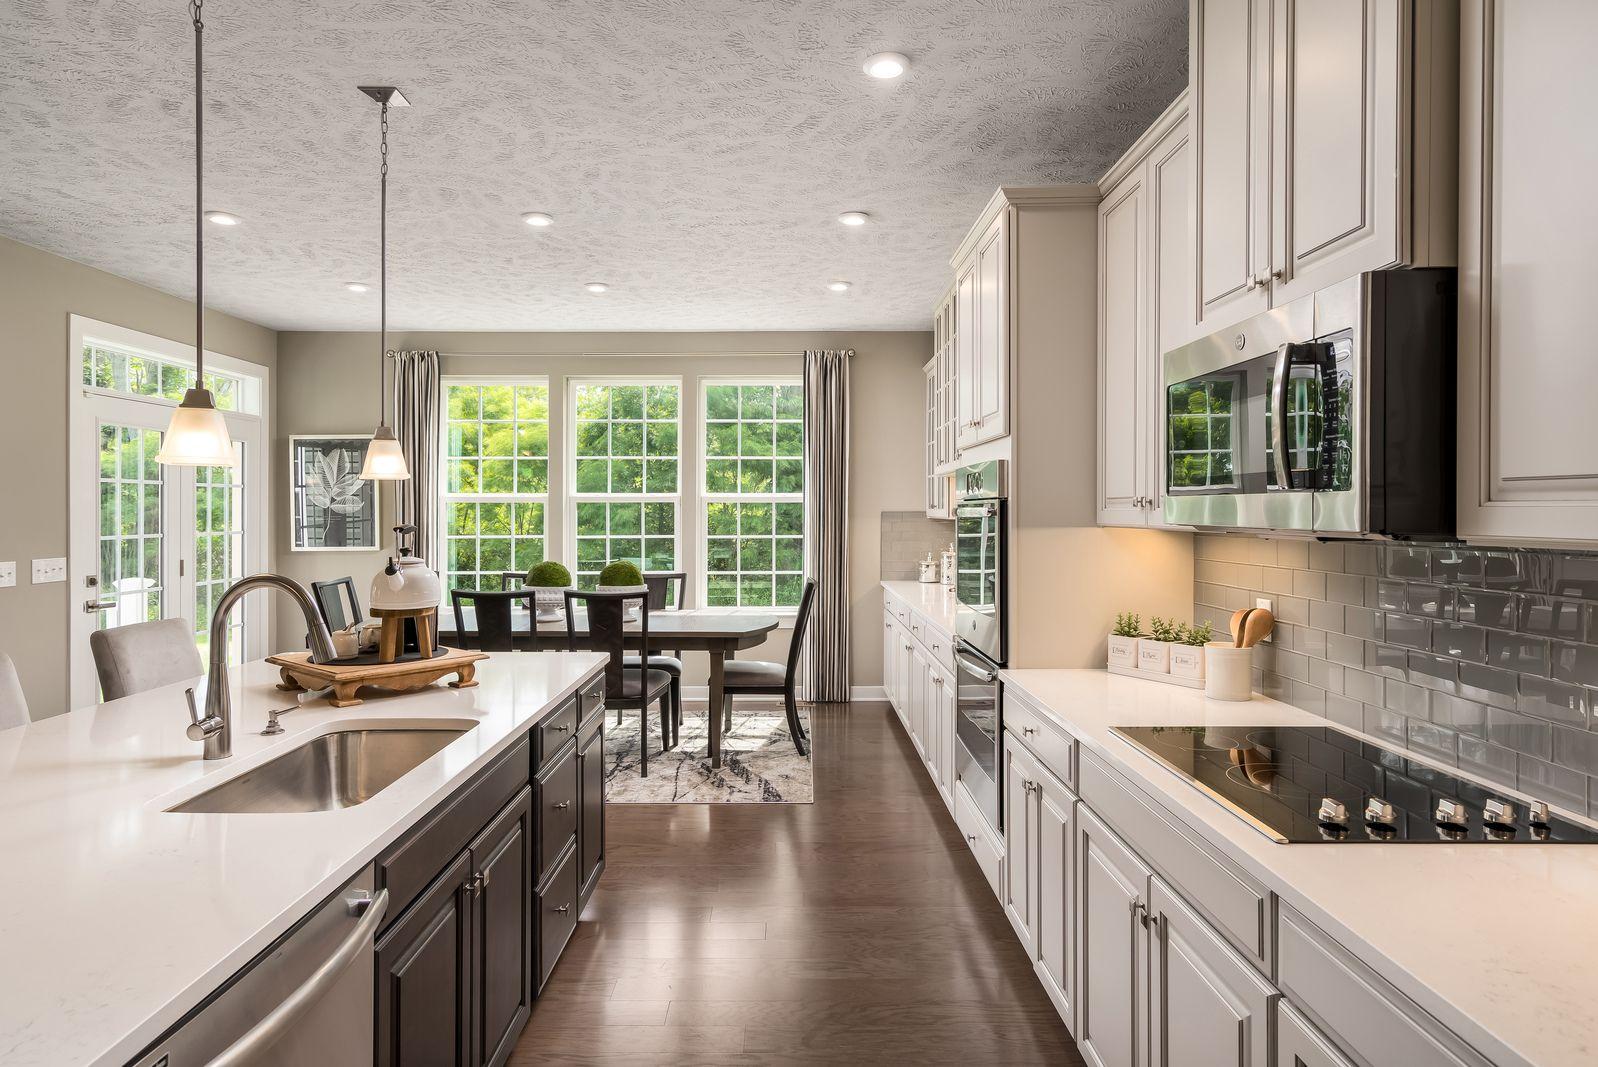 Kitchen featured in the Bateman By HeartlandHomes in Morgantown, WV